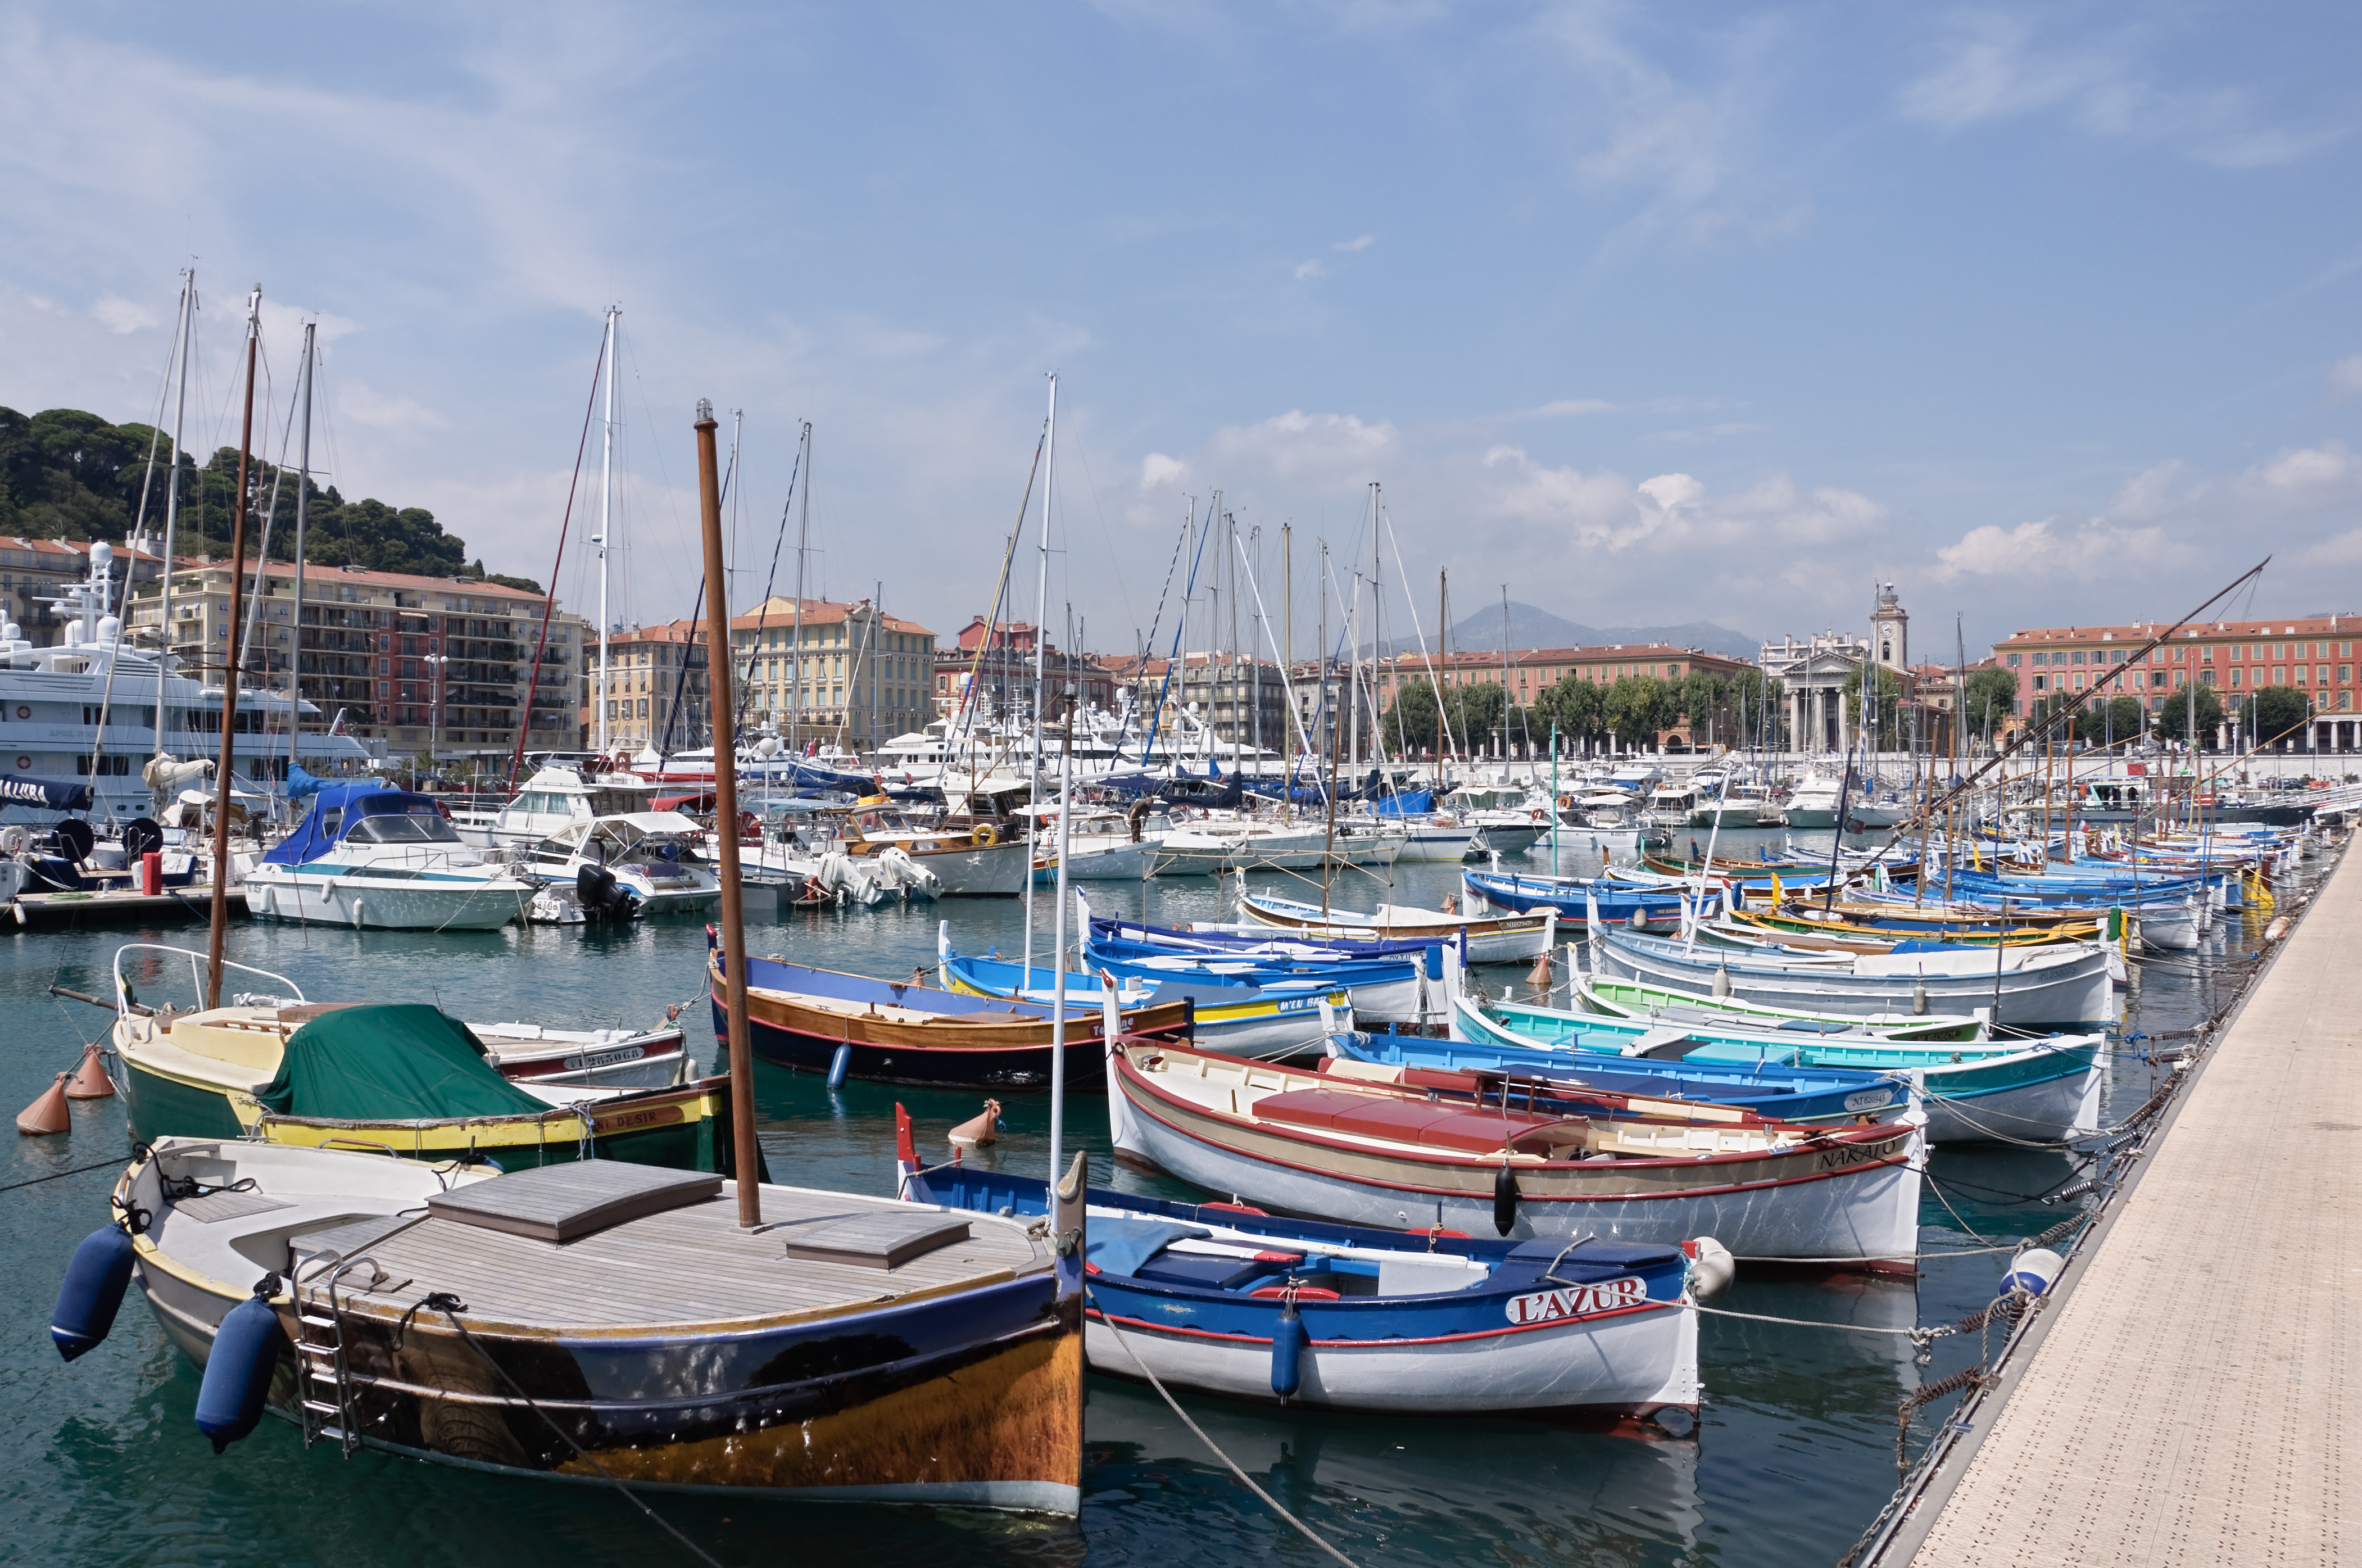 File:Nice port.jpg - Wikimedia Commons